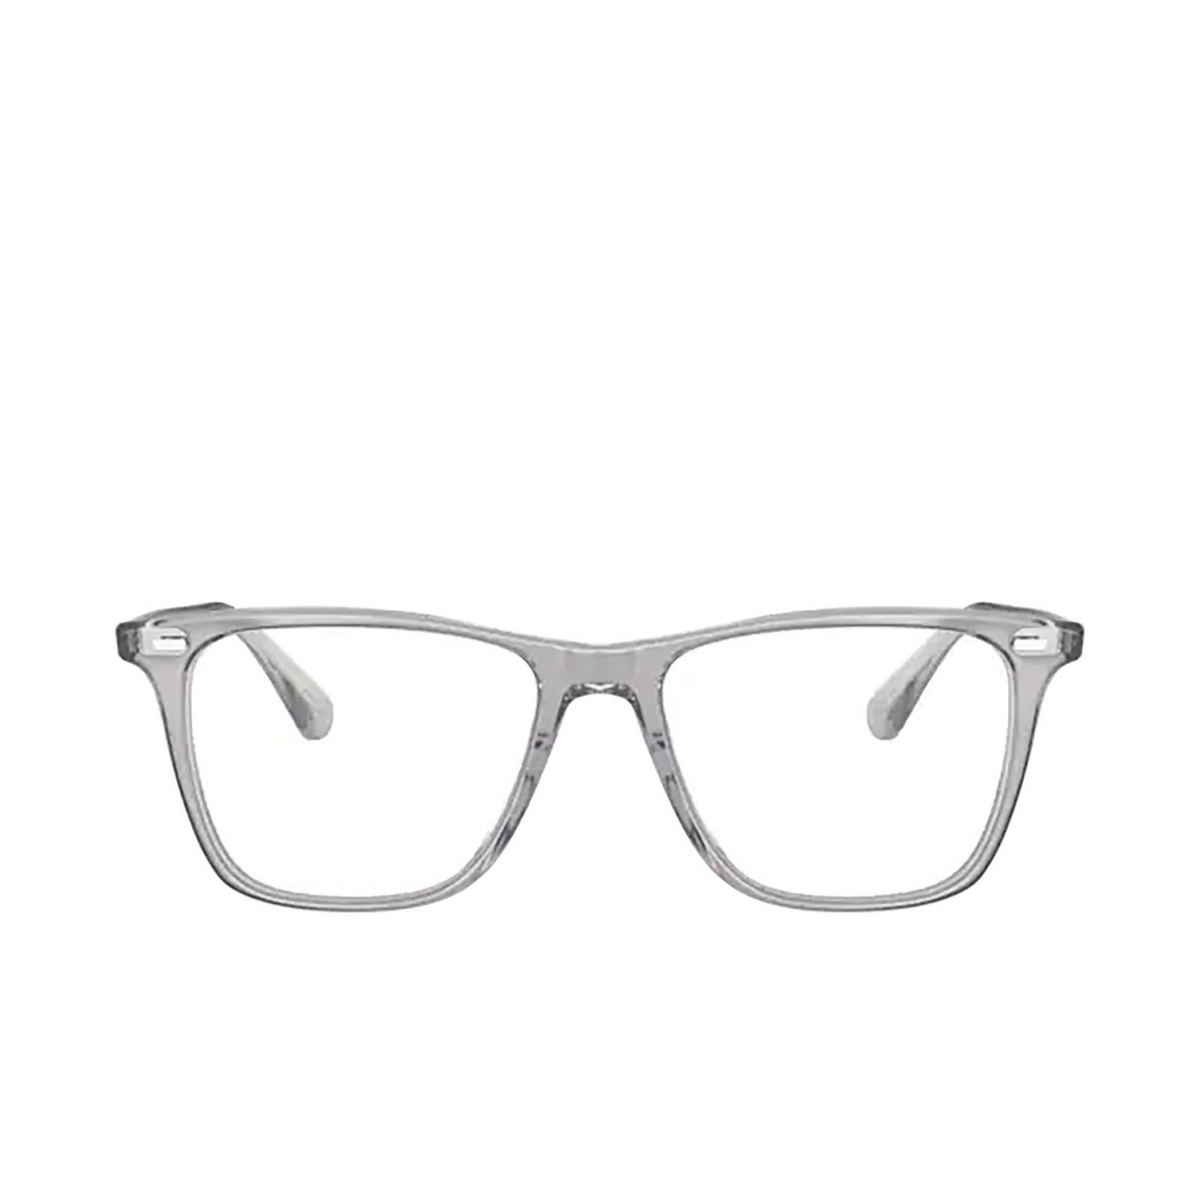 Oliver Peoples® Square Eyeglasses: Ollis OV5437U color Workman Grey 1132 - front view.